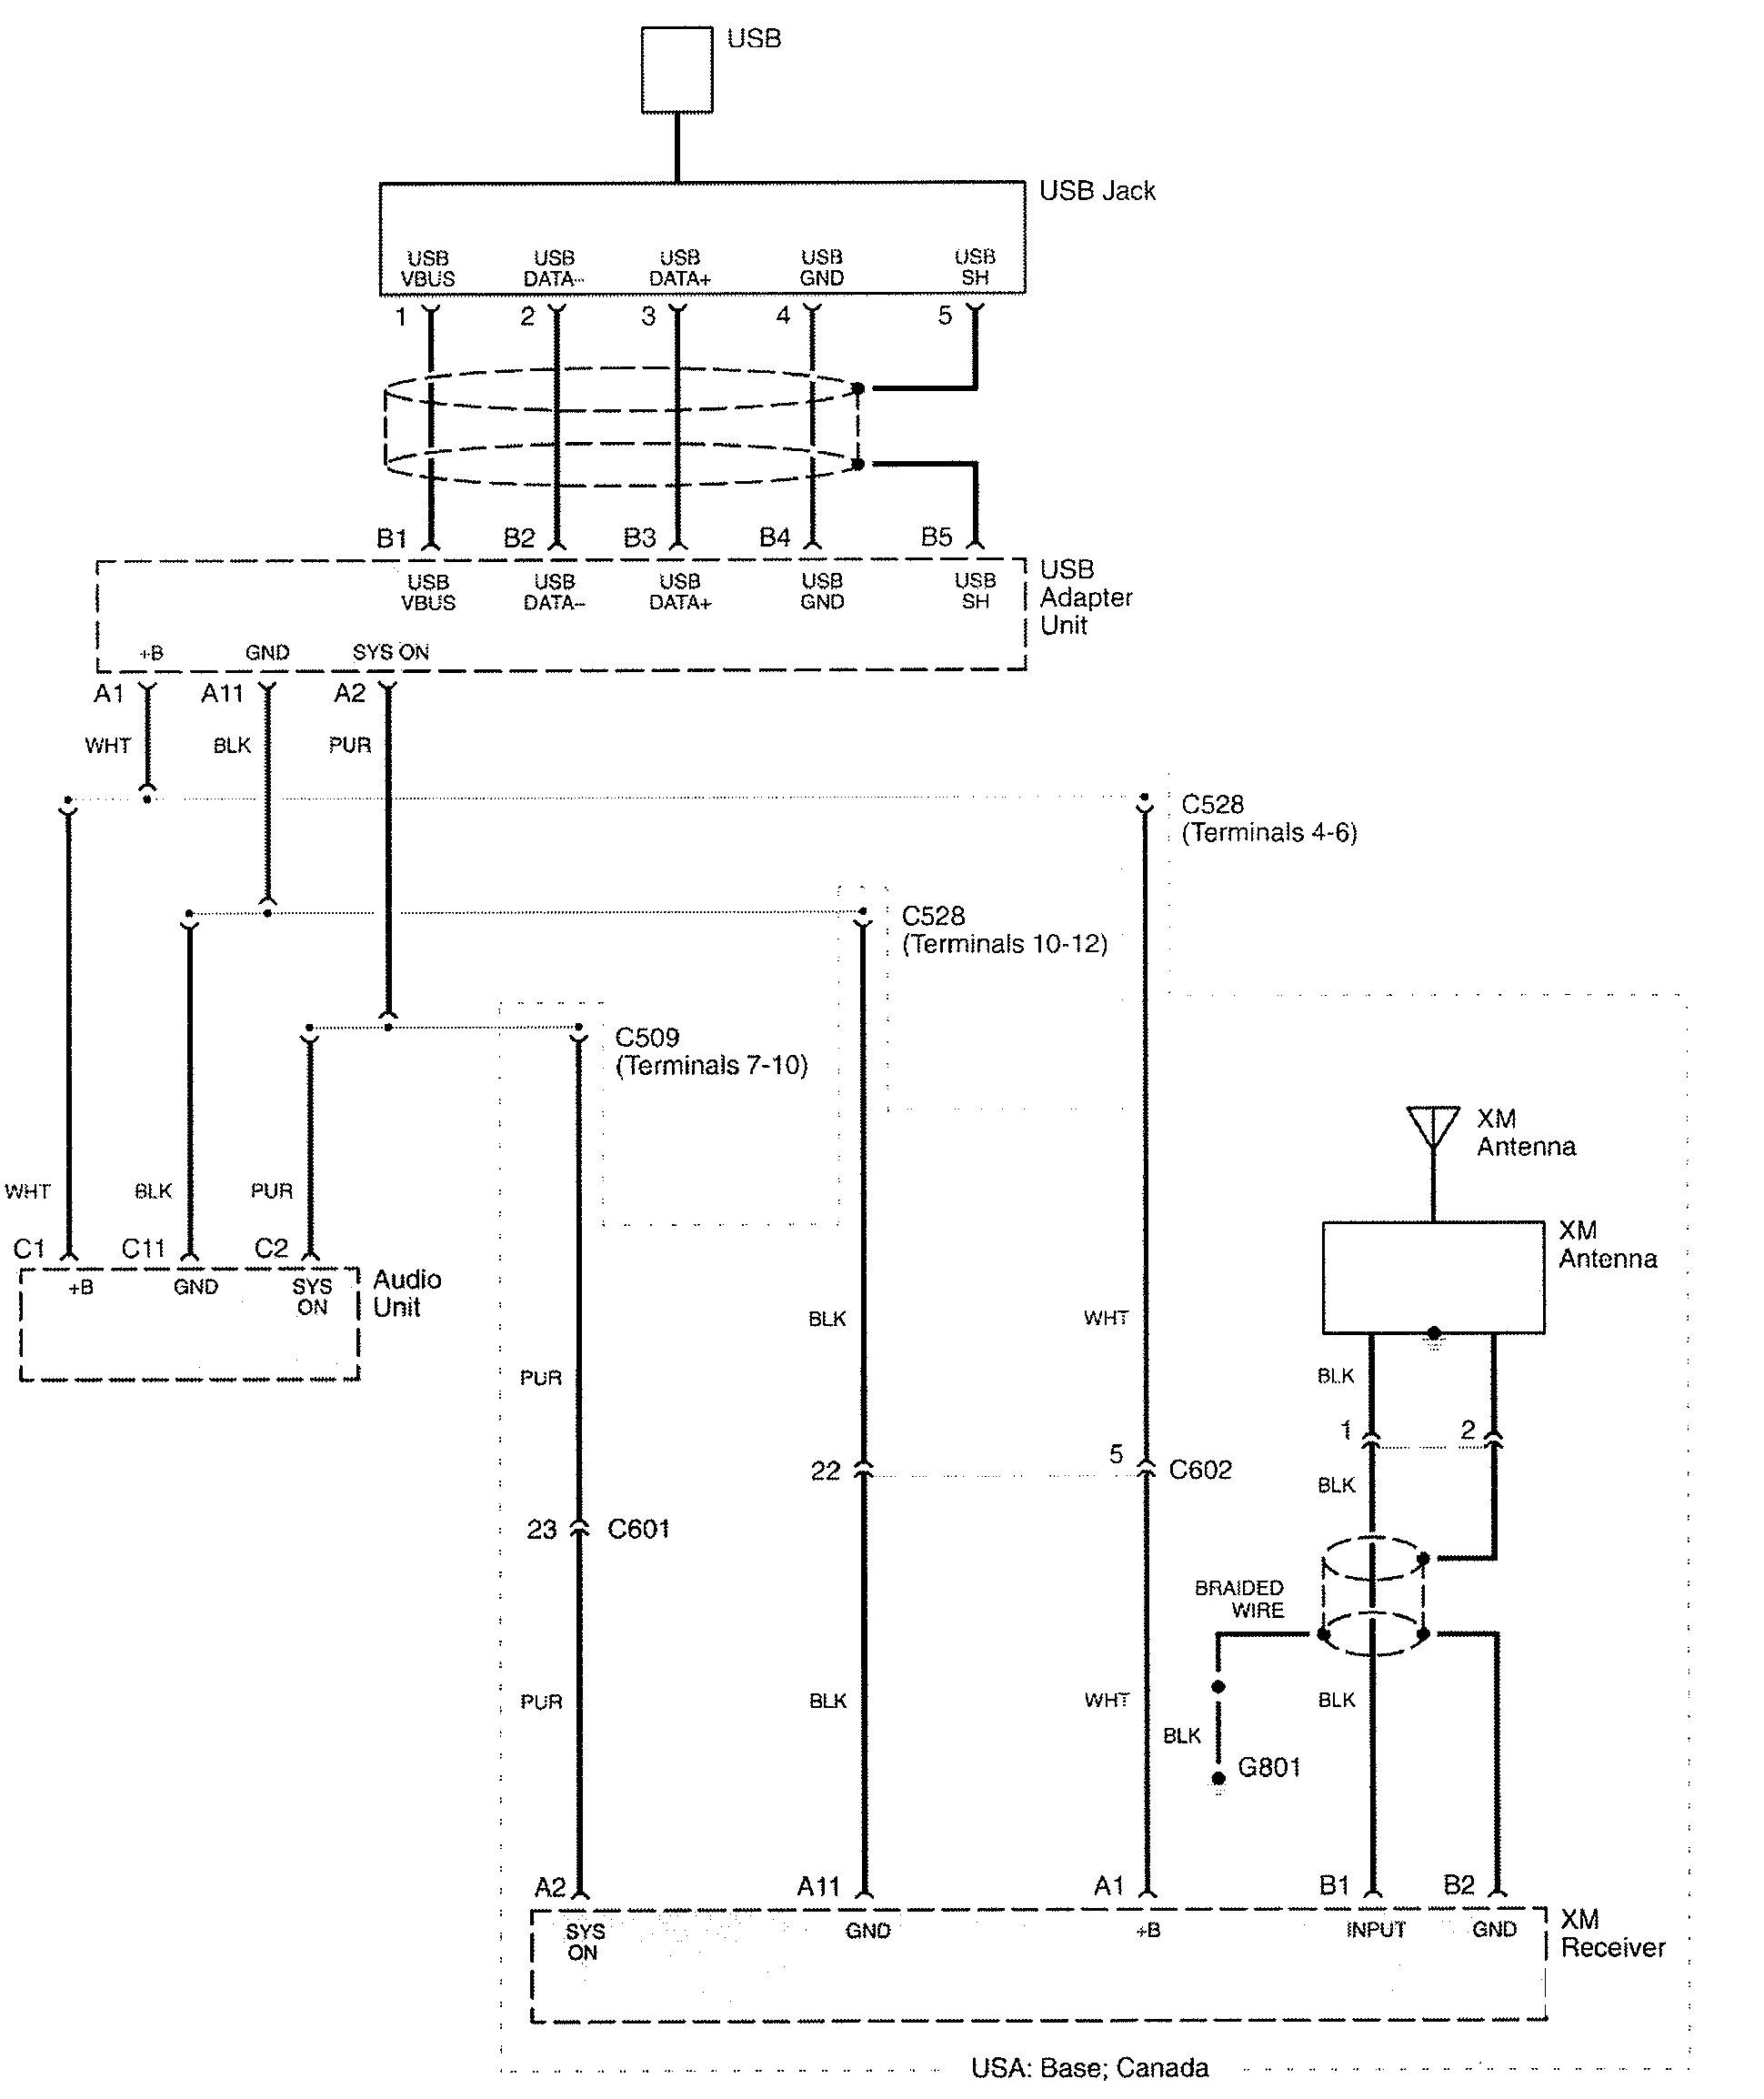 acura rl  2009 - 2010  - wiring diagrams